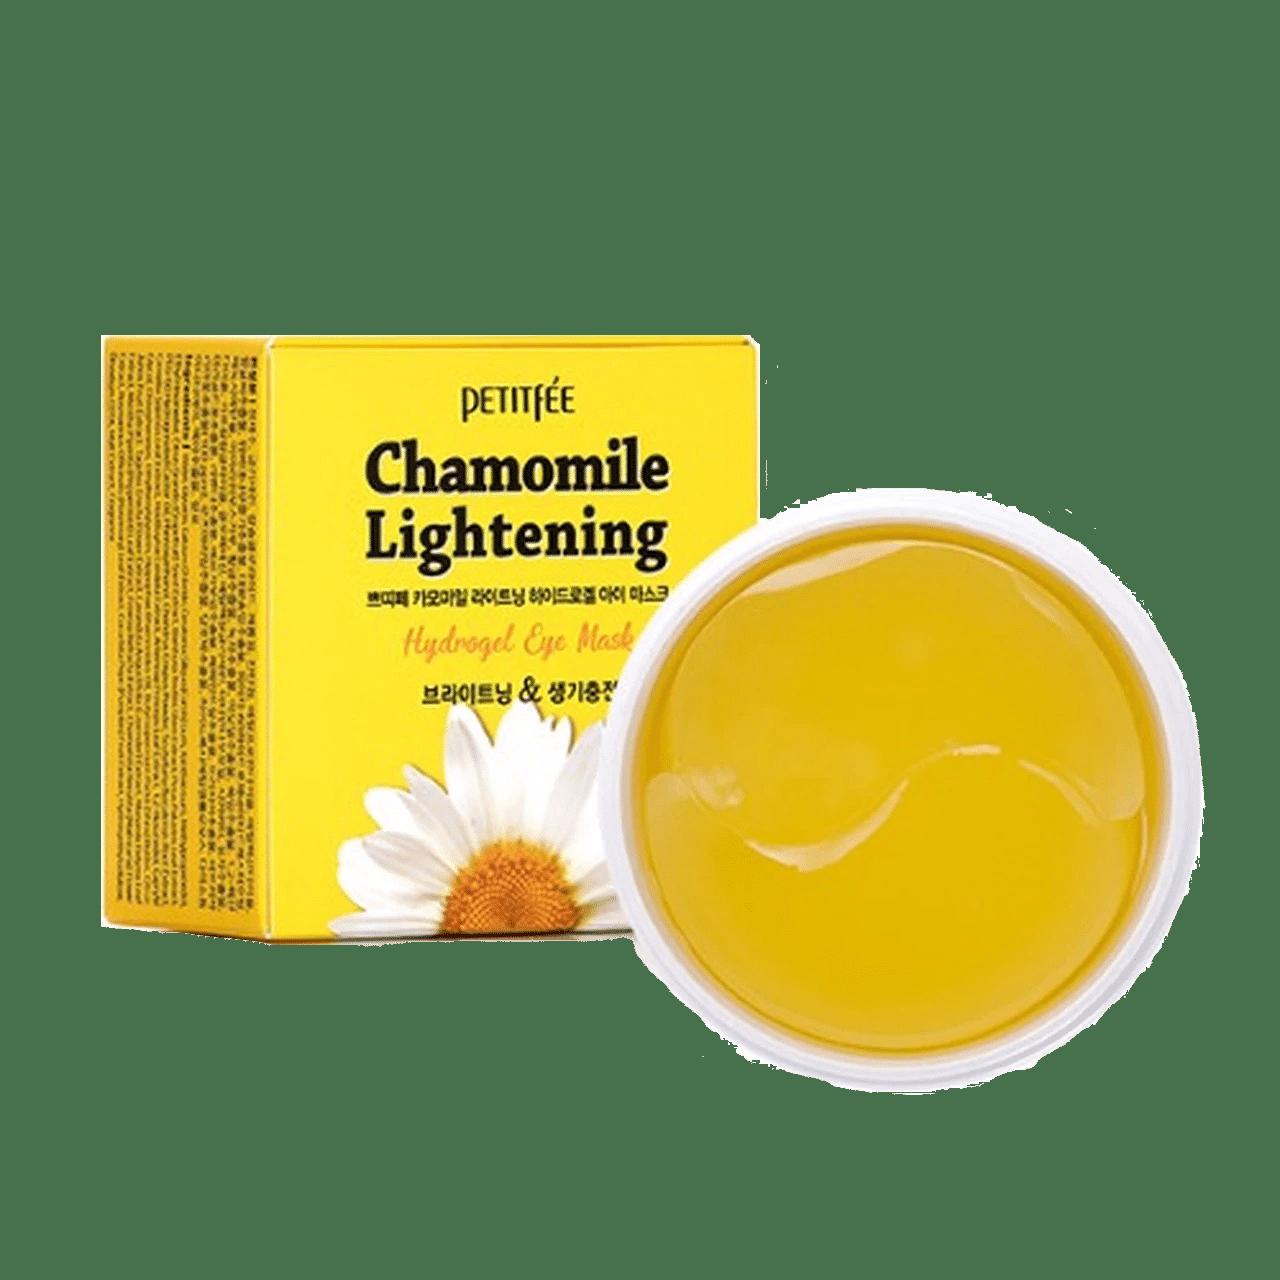 Petitfee - Chamomile Lightening Hydrogel Eye Mask 1